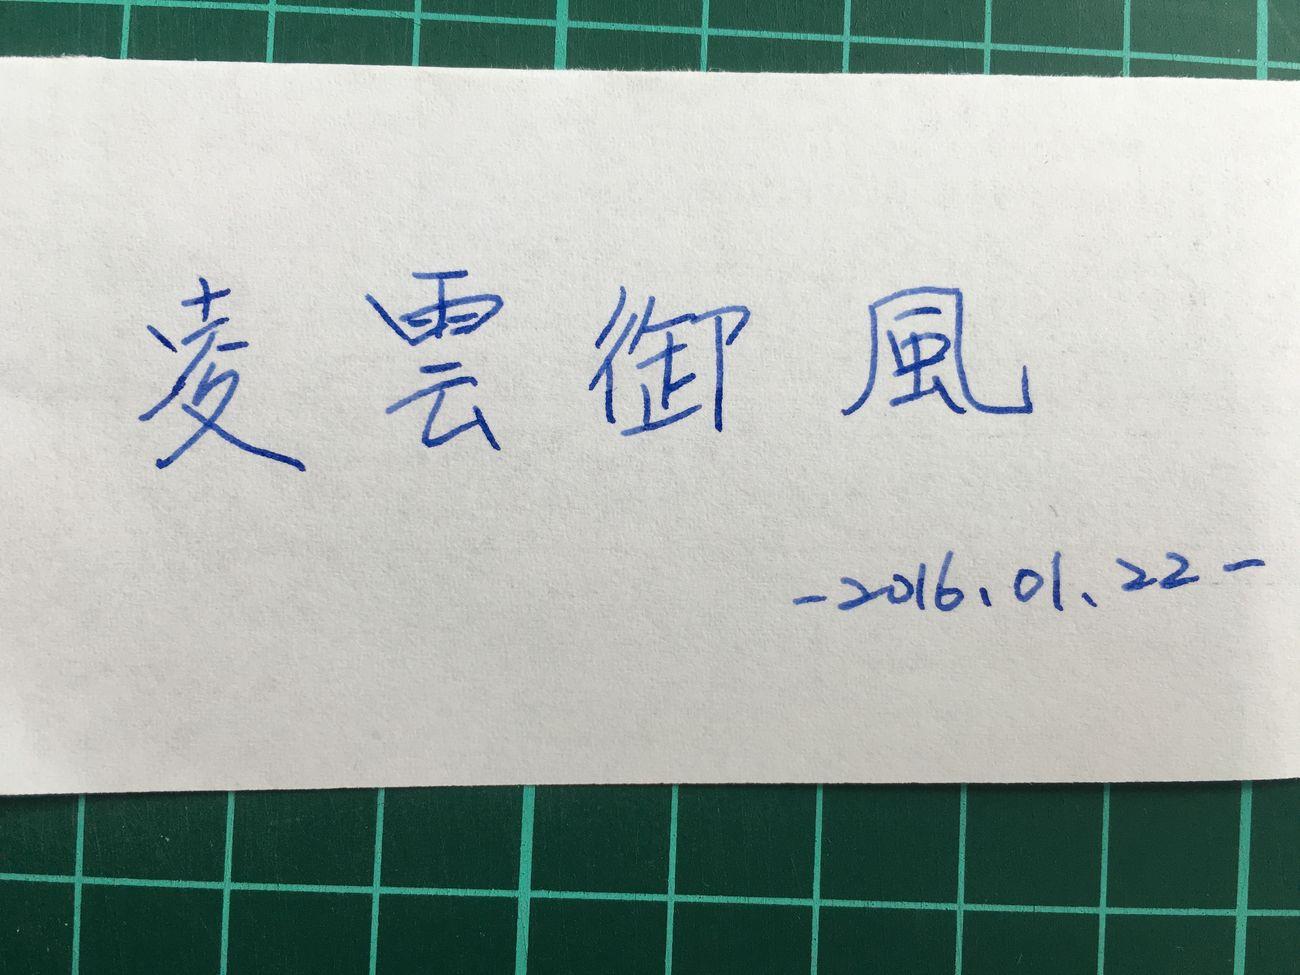 Taiwanese Kaohsiung 臺灣 Taiwan 高雄 鋼筆 一月 中文 文具 墨水 前鎮區 January Lamy